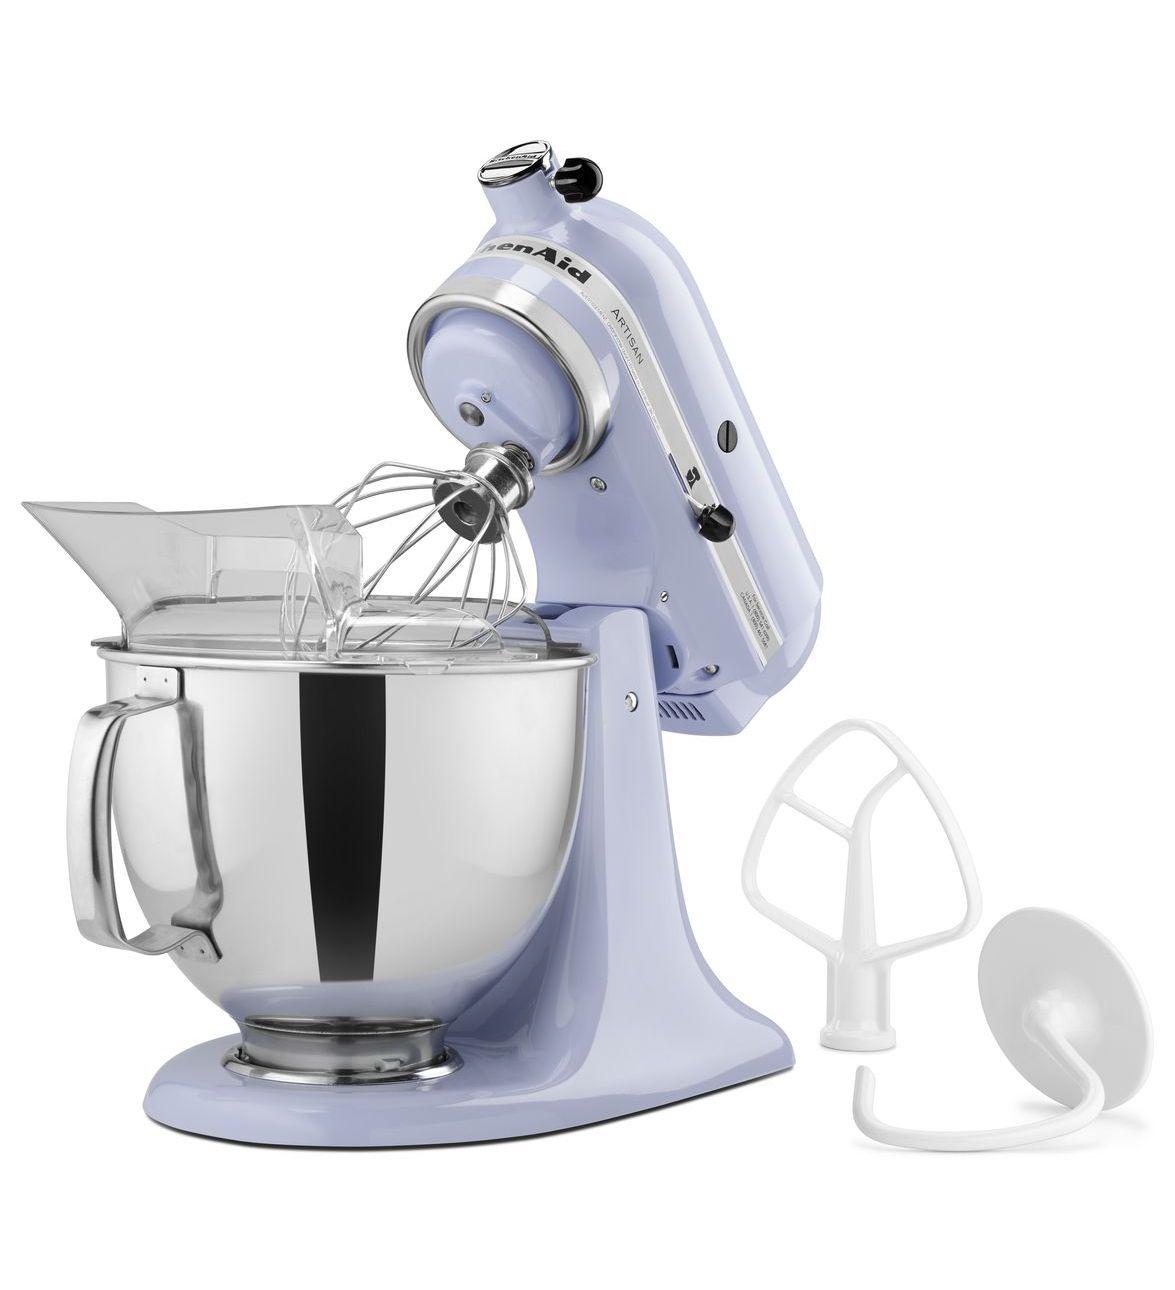 Kitchen aid hand mixer Photo - 4